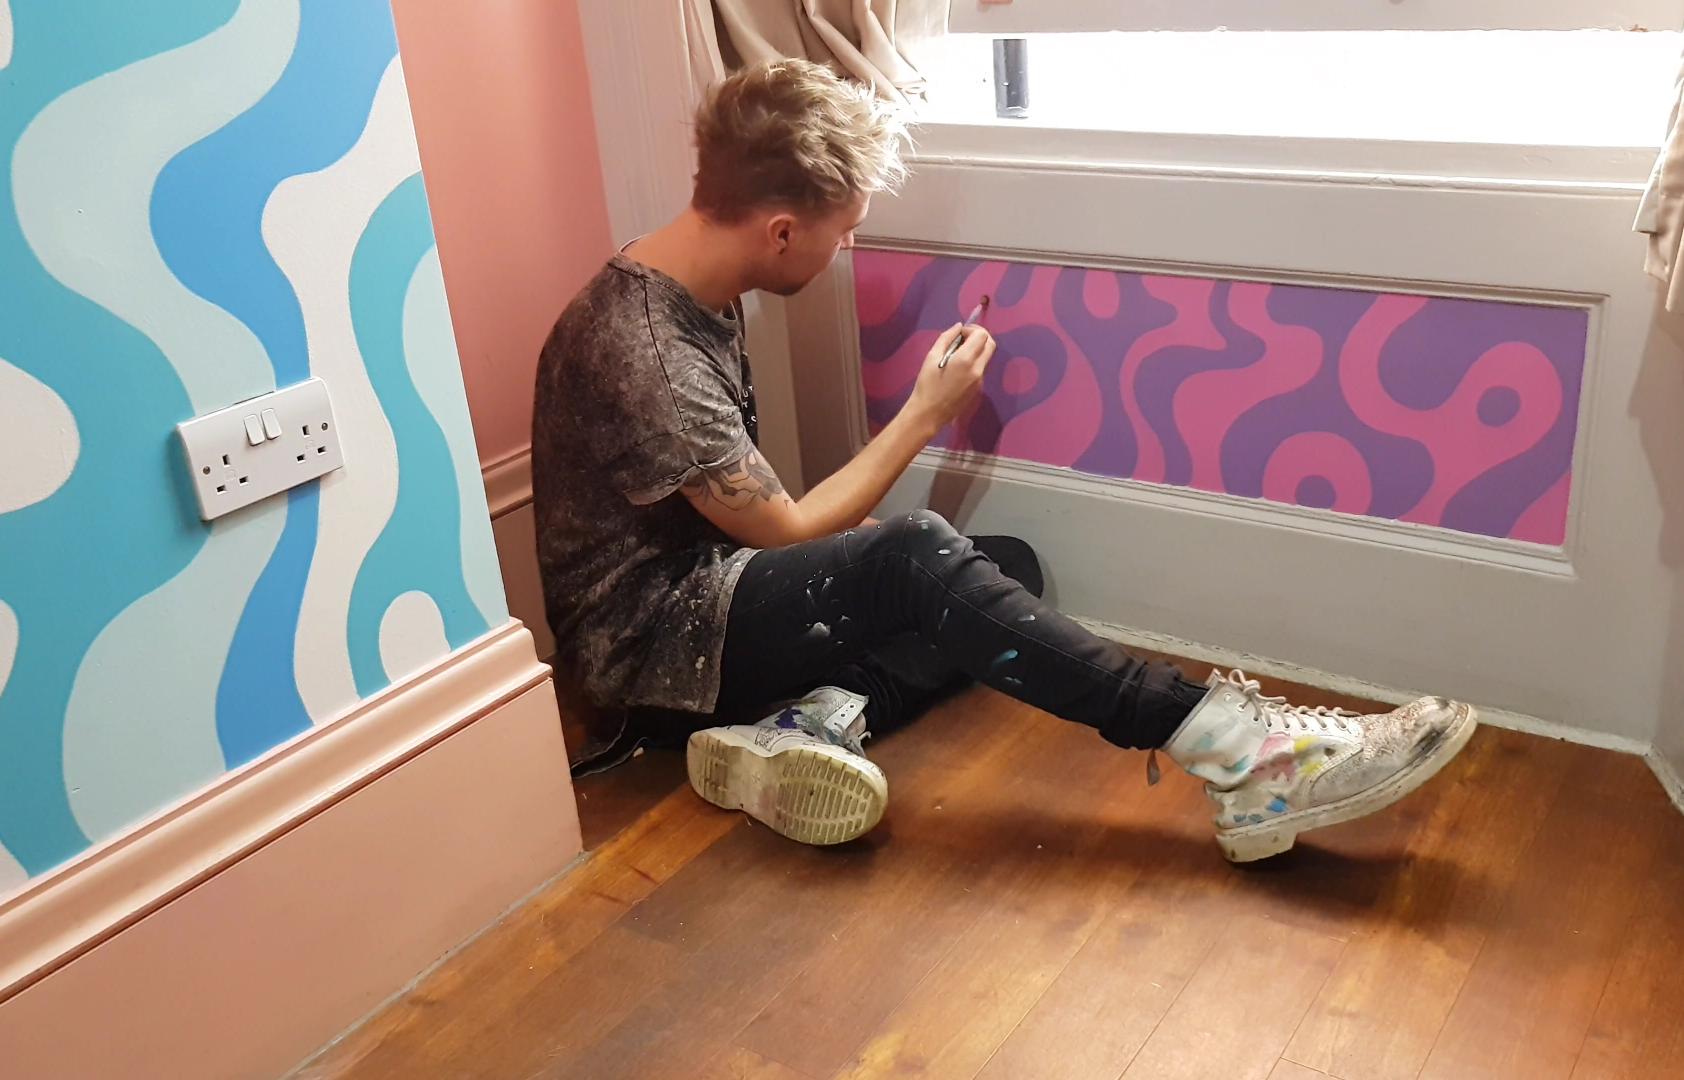 AZZURRO in London, painting for Clink78 Hostel. Nov 2017.